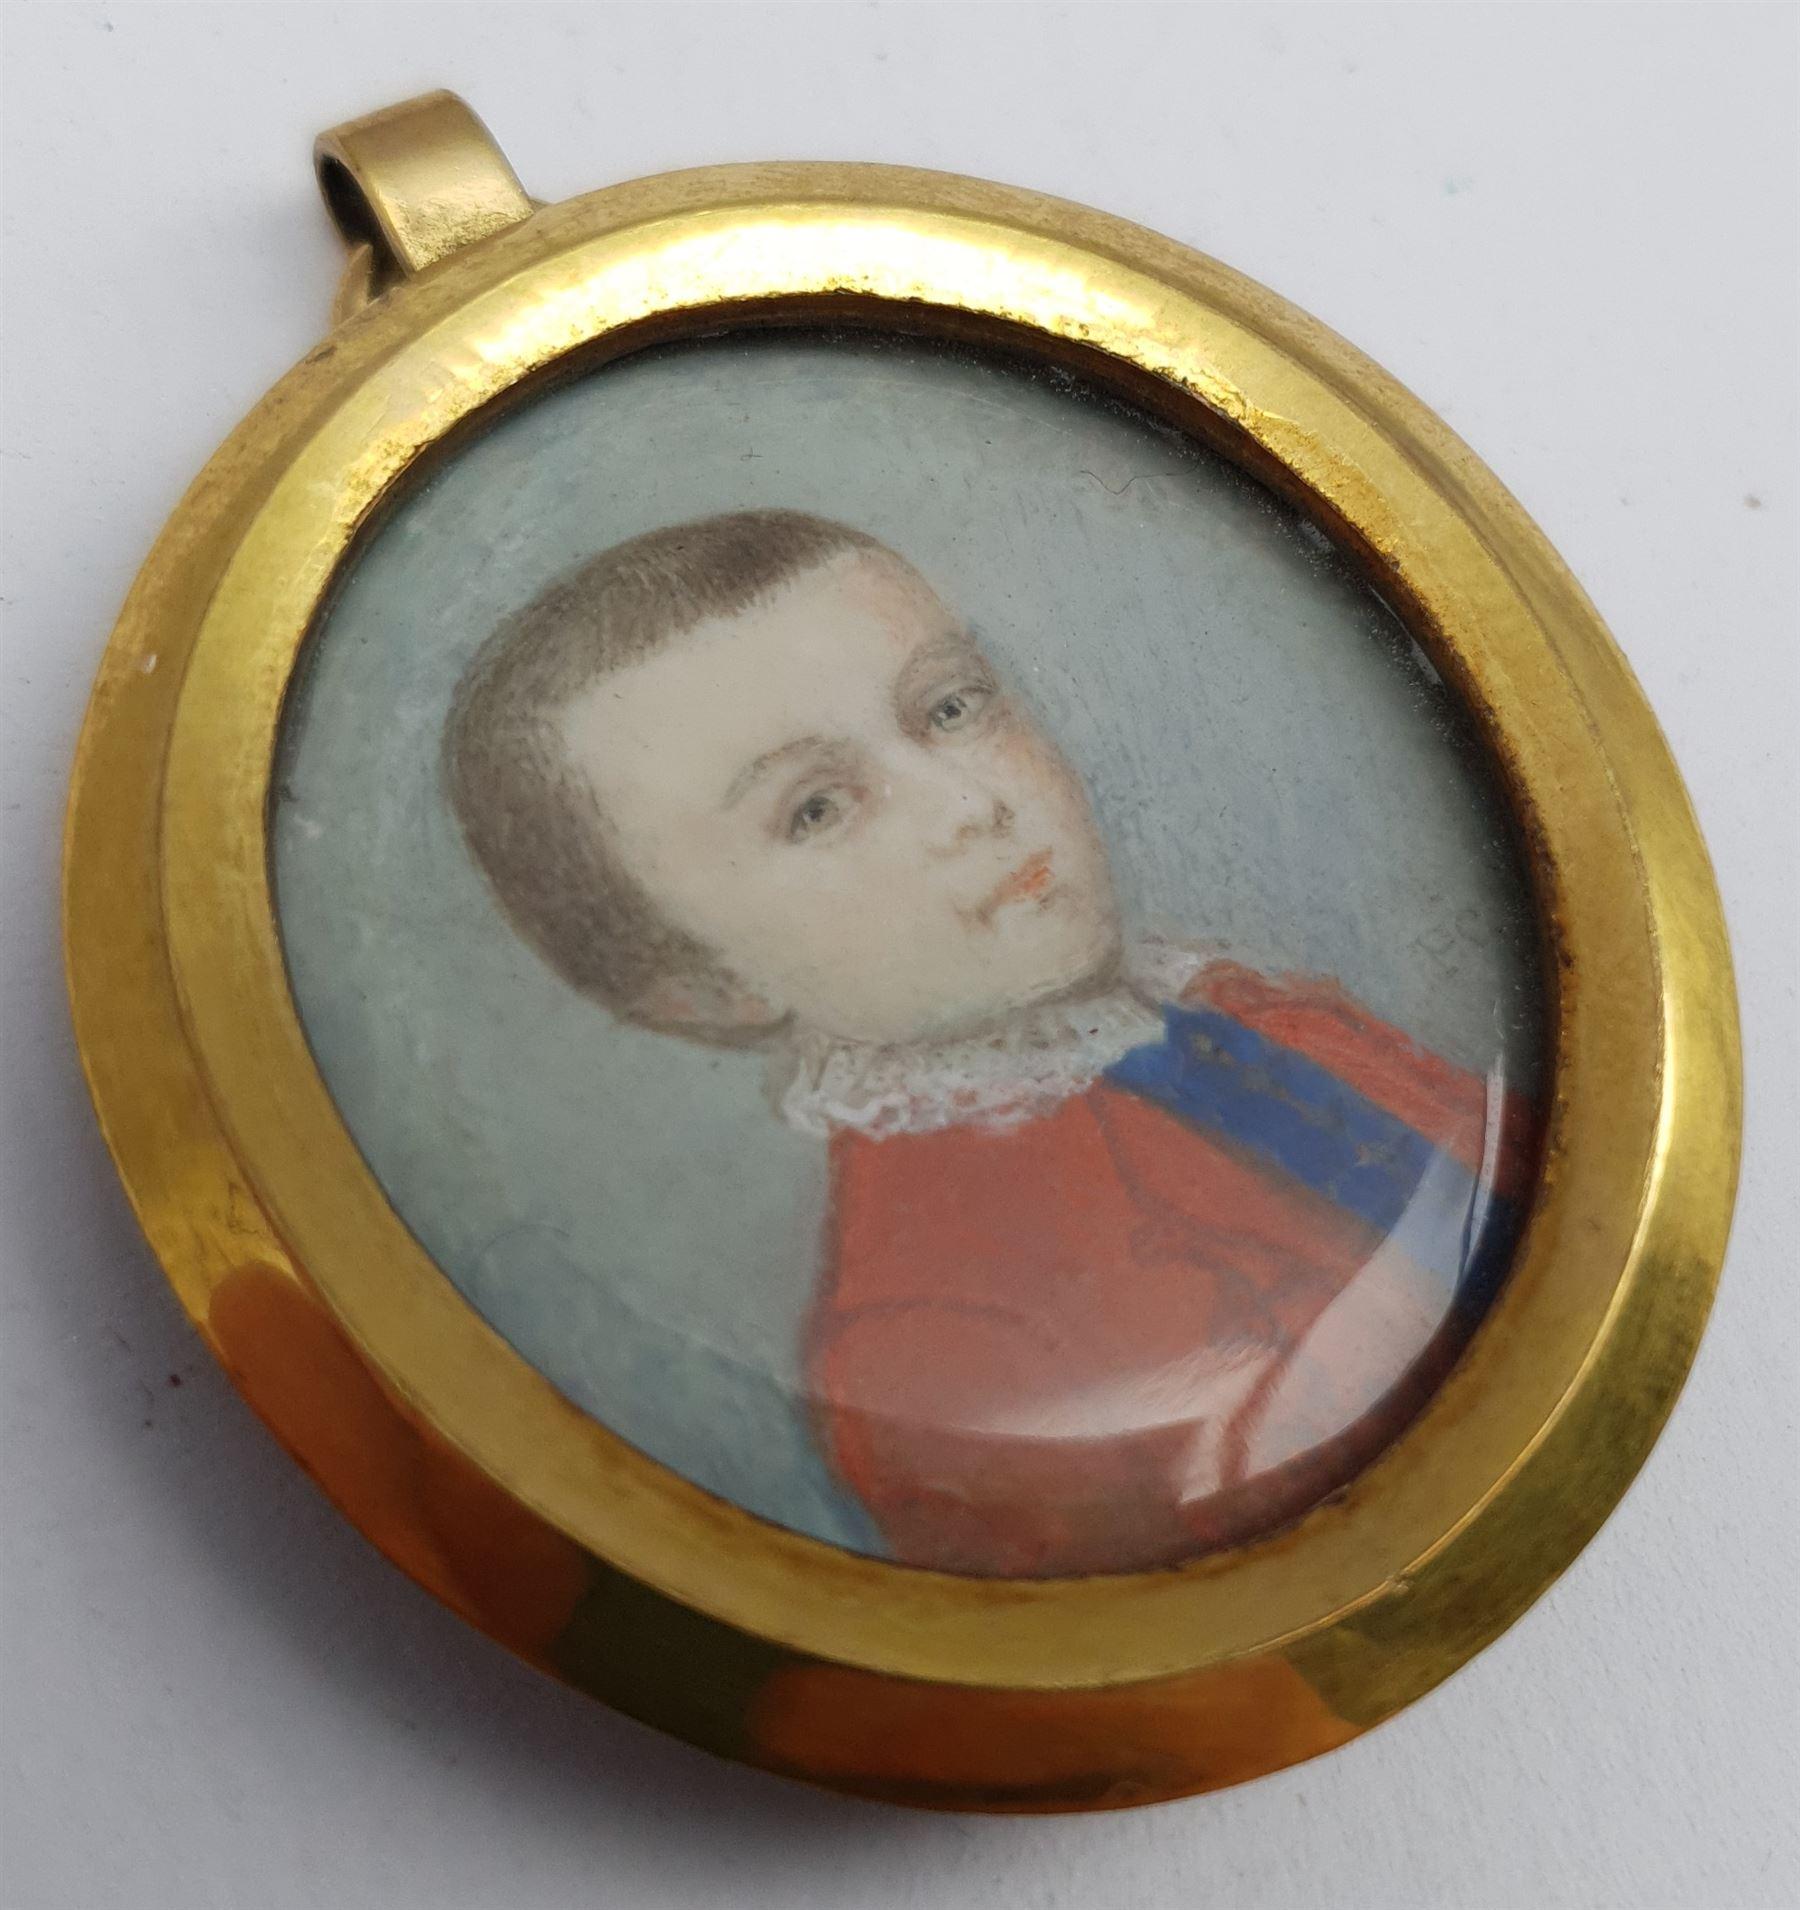 Penelope Carwardine (British 1729-1804): 'Justinian Saunders Bentley Nutt' - Image 3 of 7